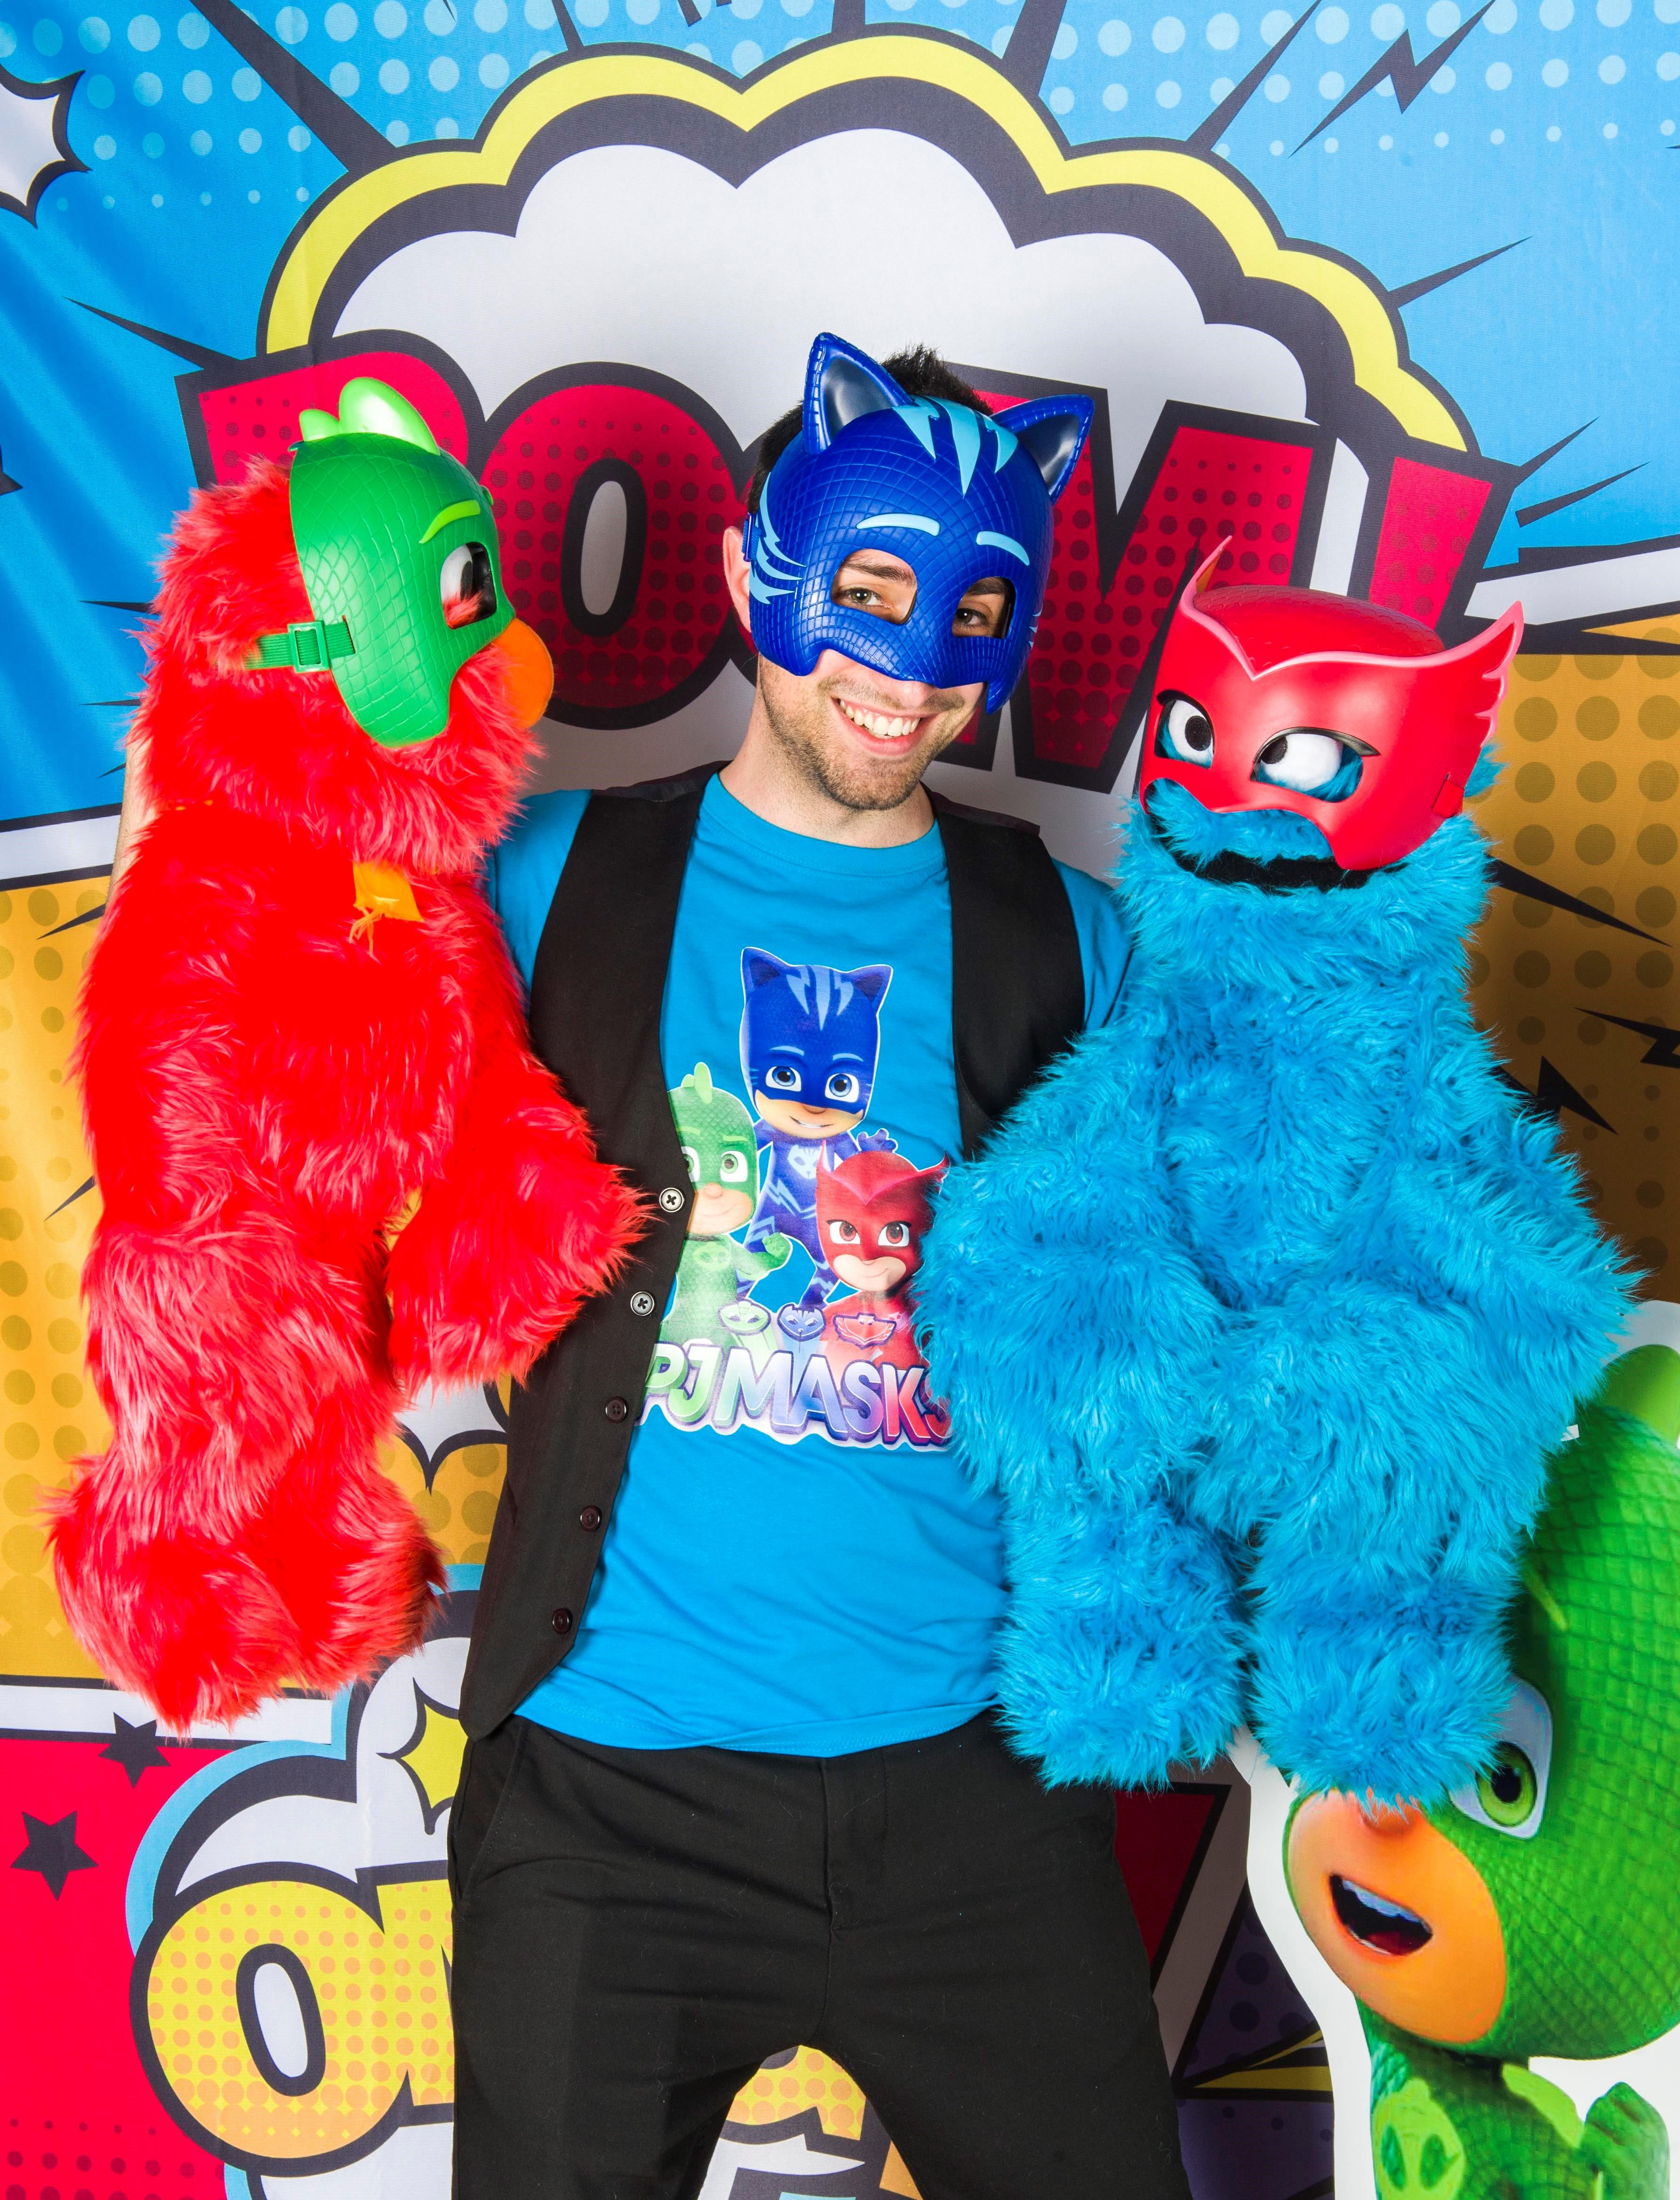 Festa di compleanno per bambini a tema Pjmasks